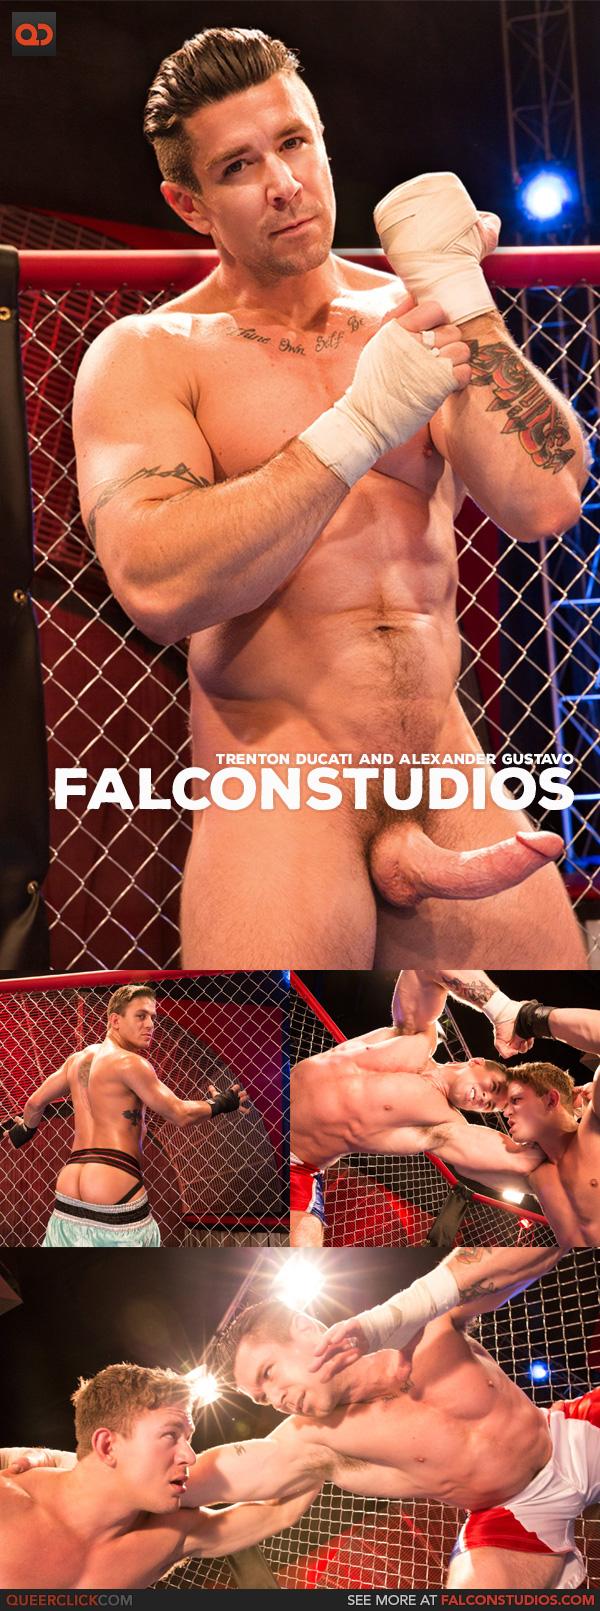 Falcon Studios: Trenton Ducati and Alexander Gustavo